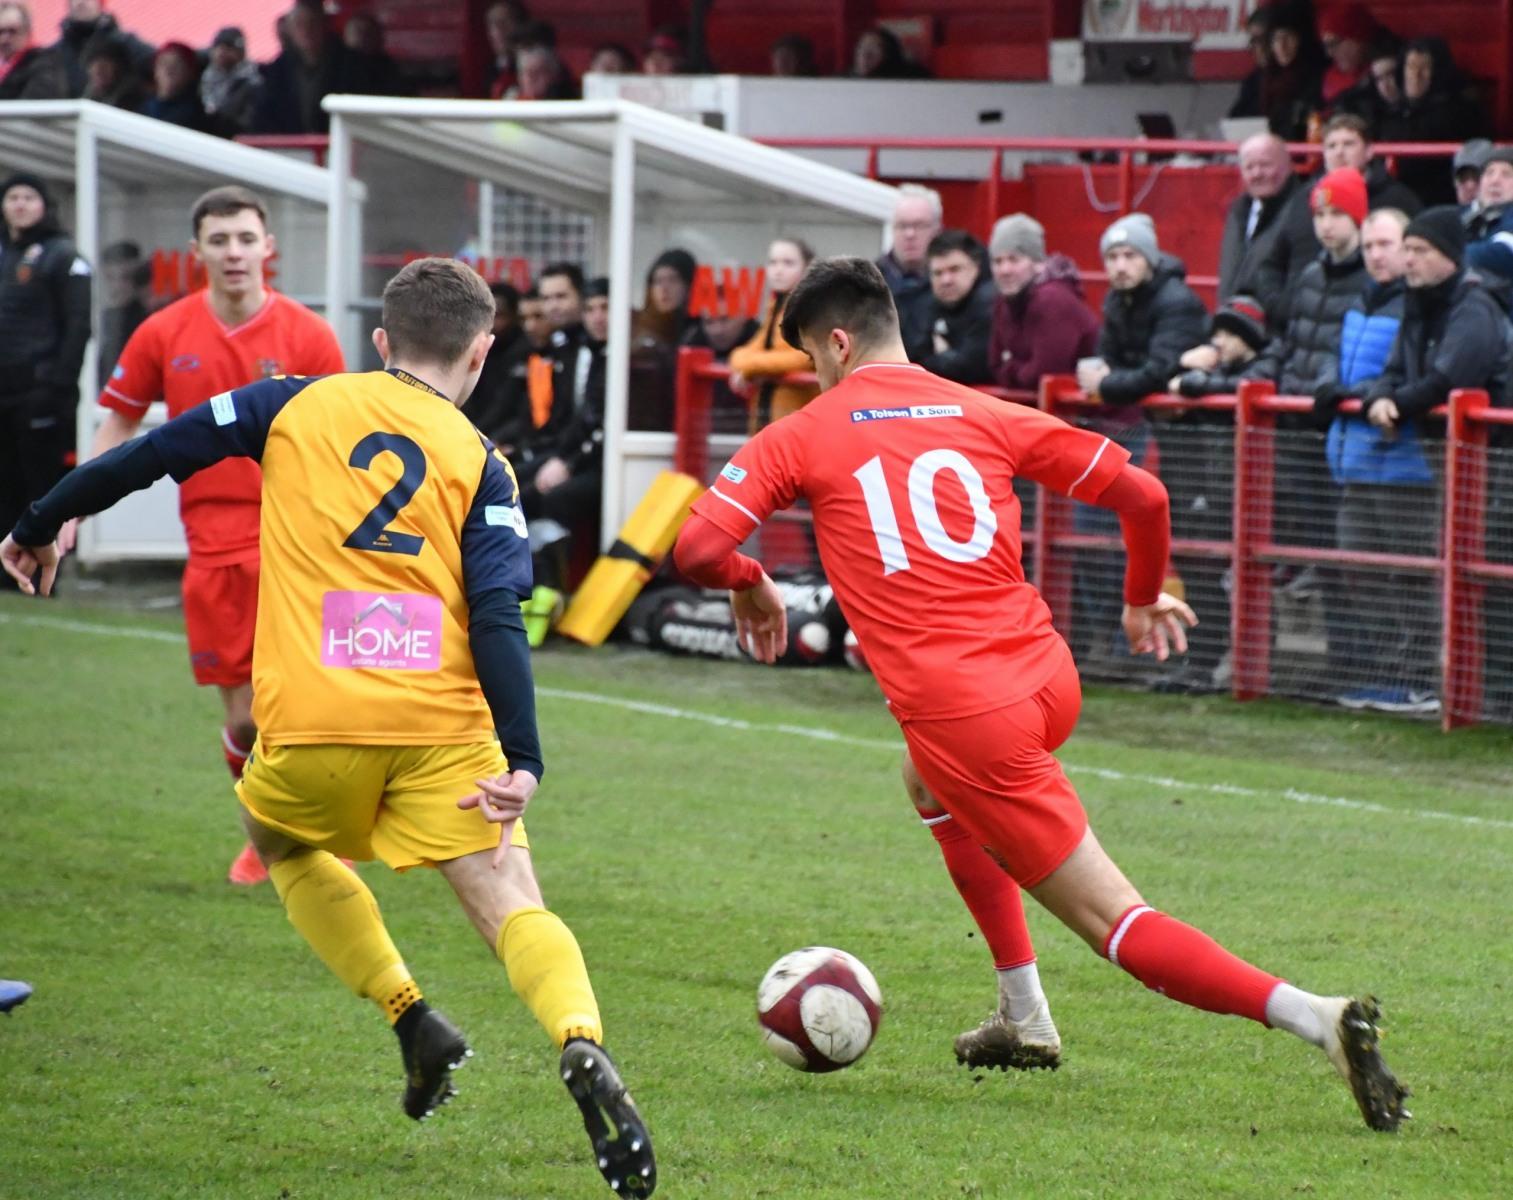 Workington-Reds-v-Trafford-Ben-Challis-11-scaled